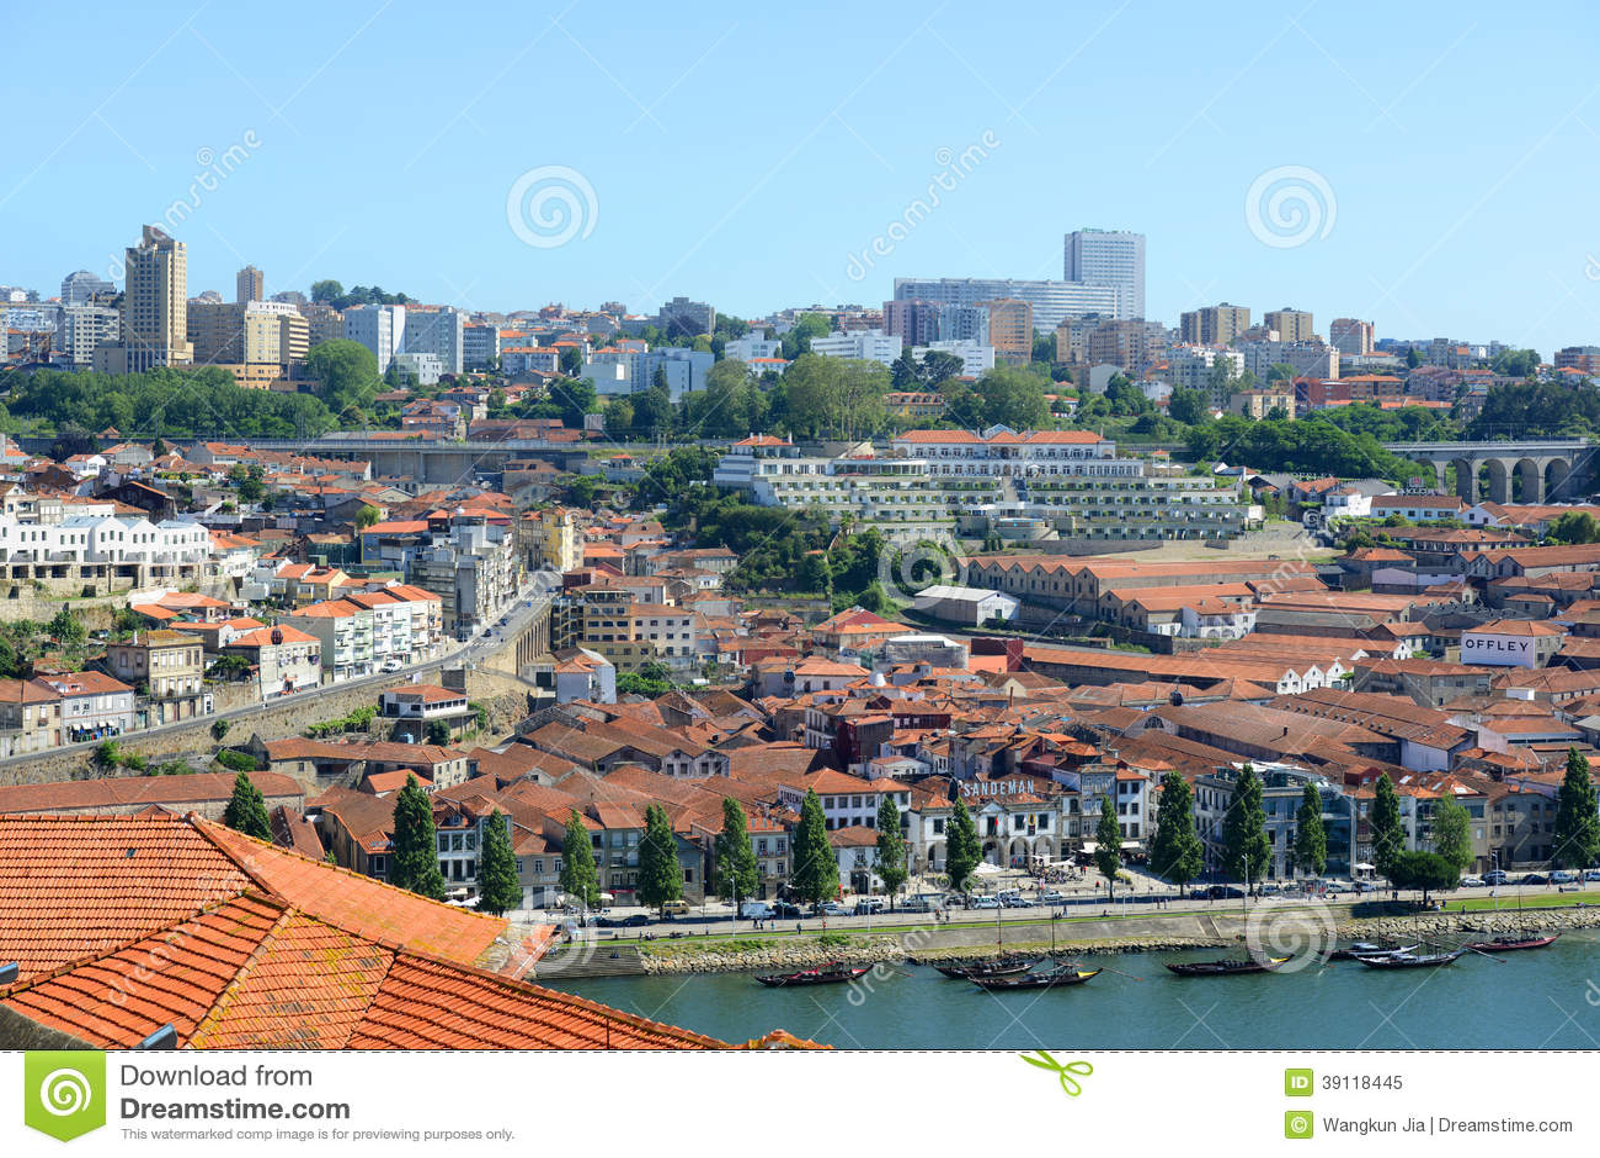 Vila Nova de Gaia, Porto, Portugal